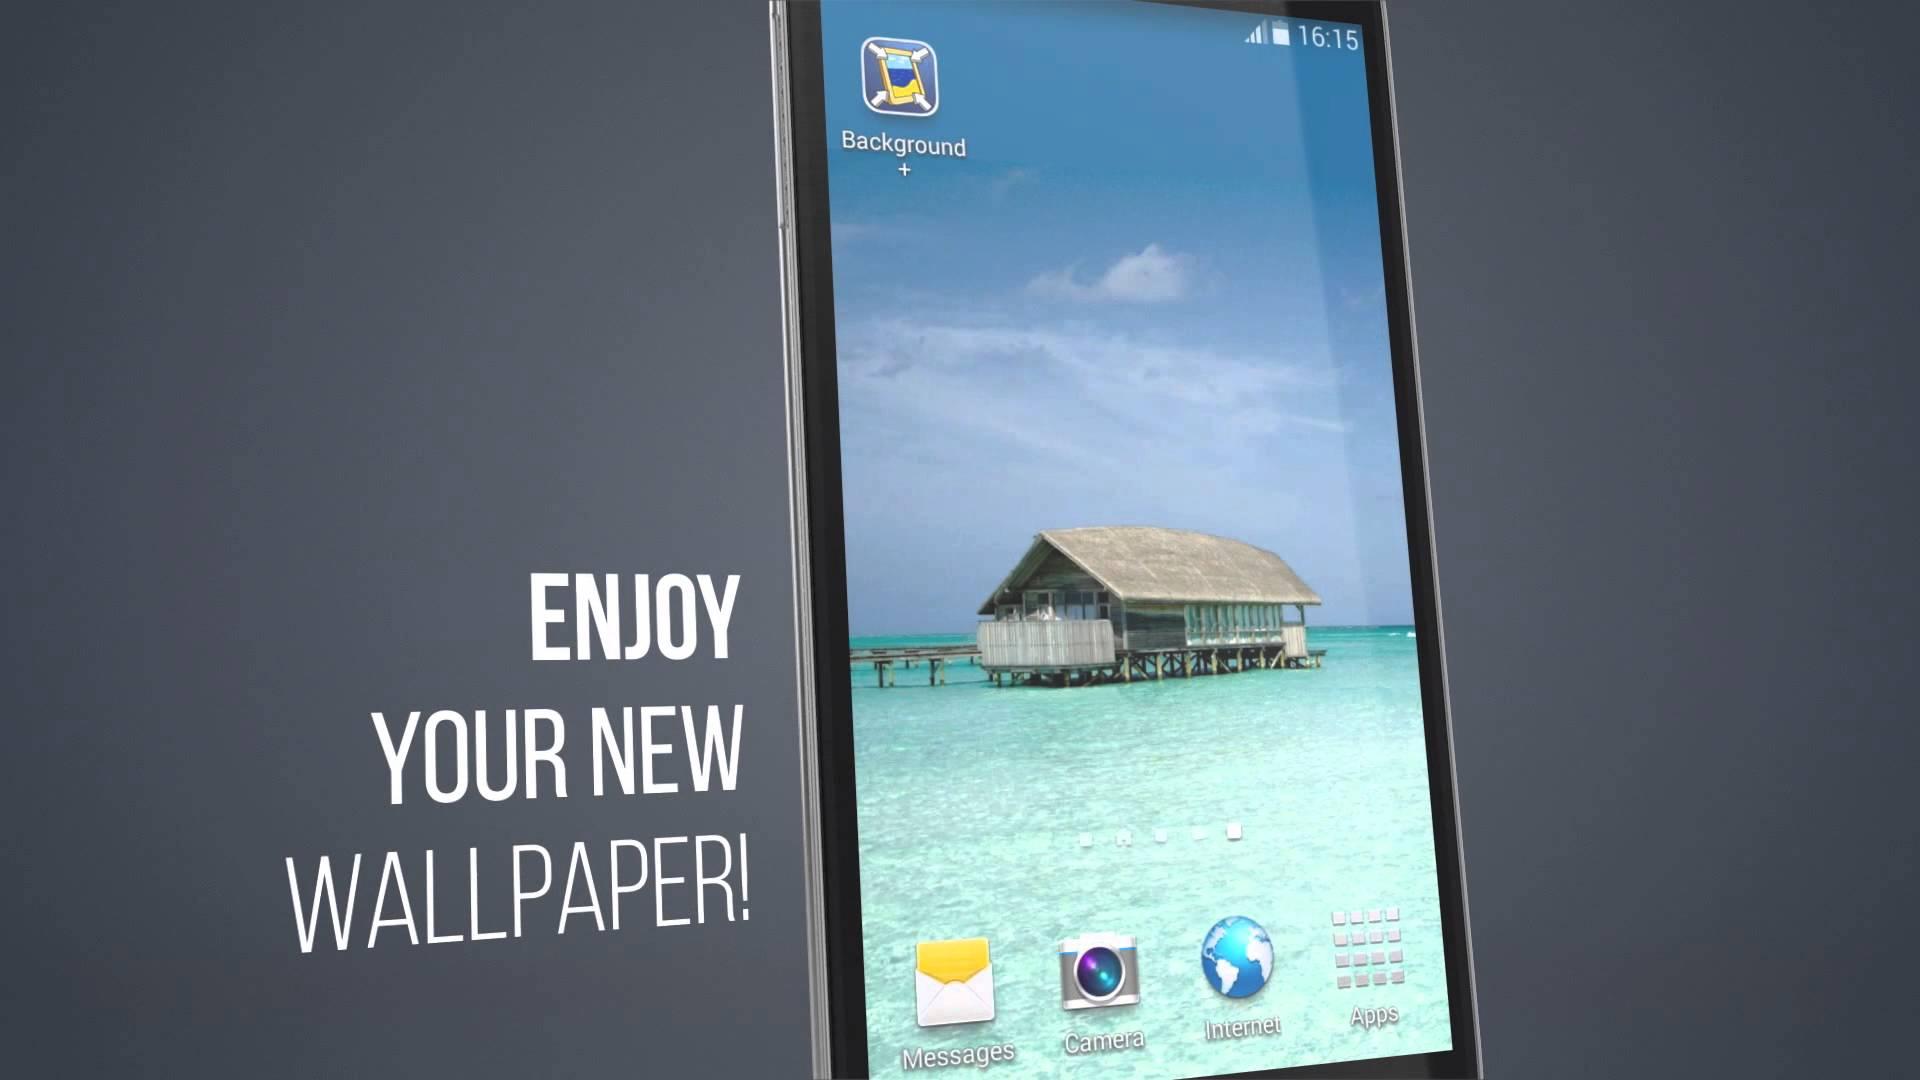 50+] Android Wallpaper Resizer on WallpaperSafari